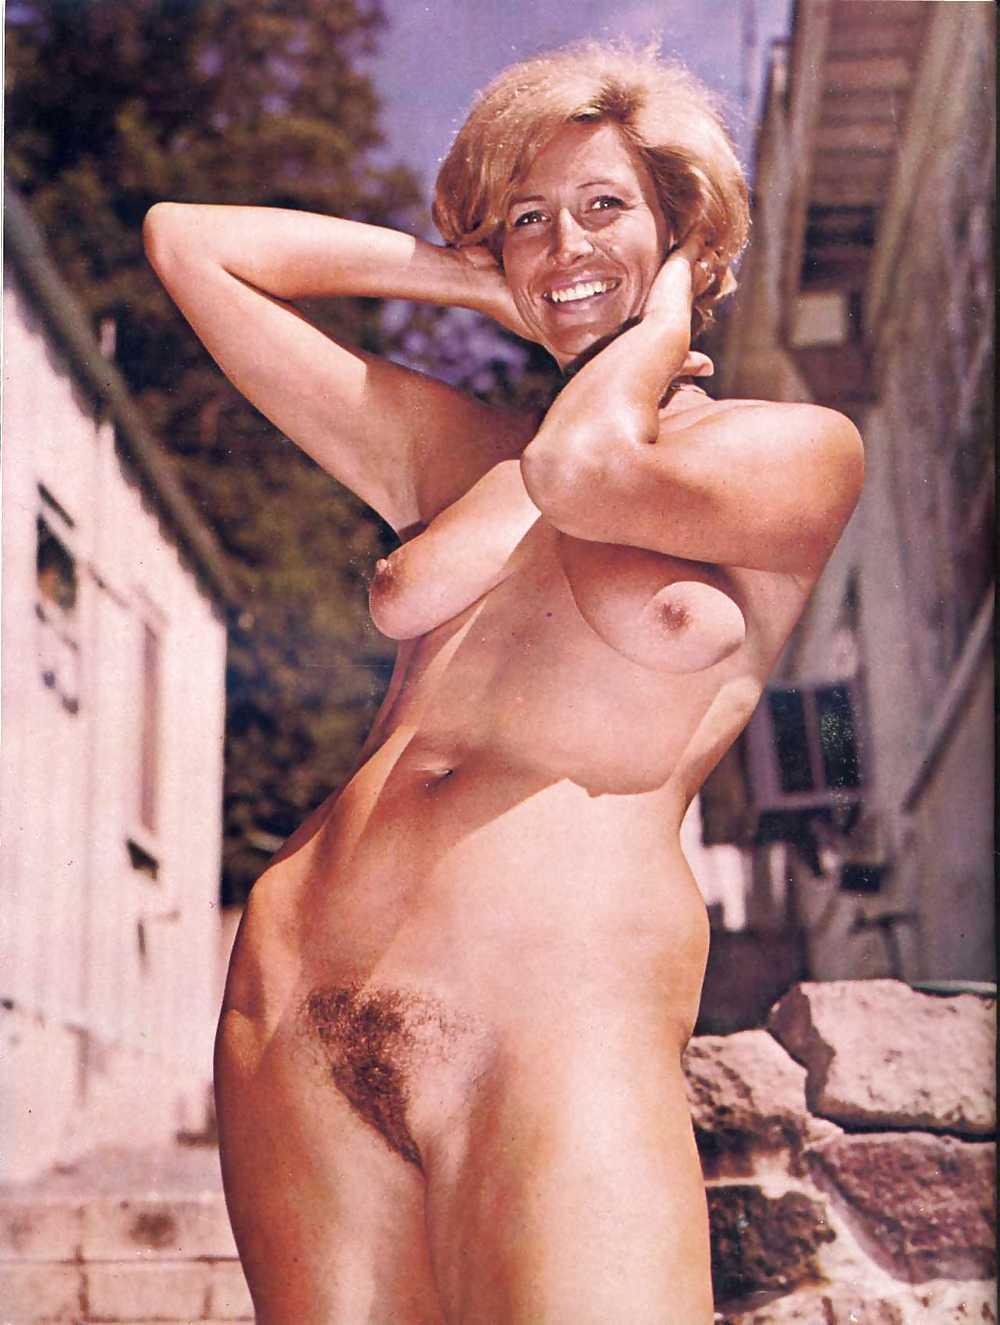 Vintage mom pics, hot cougar moms porn galleries